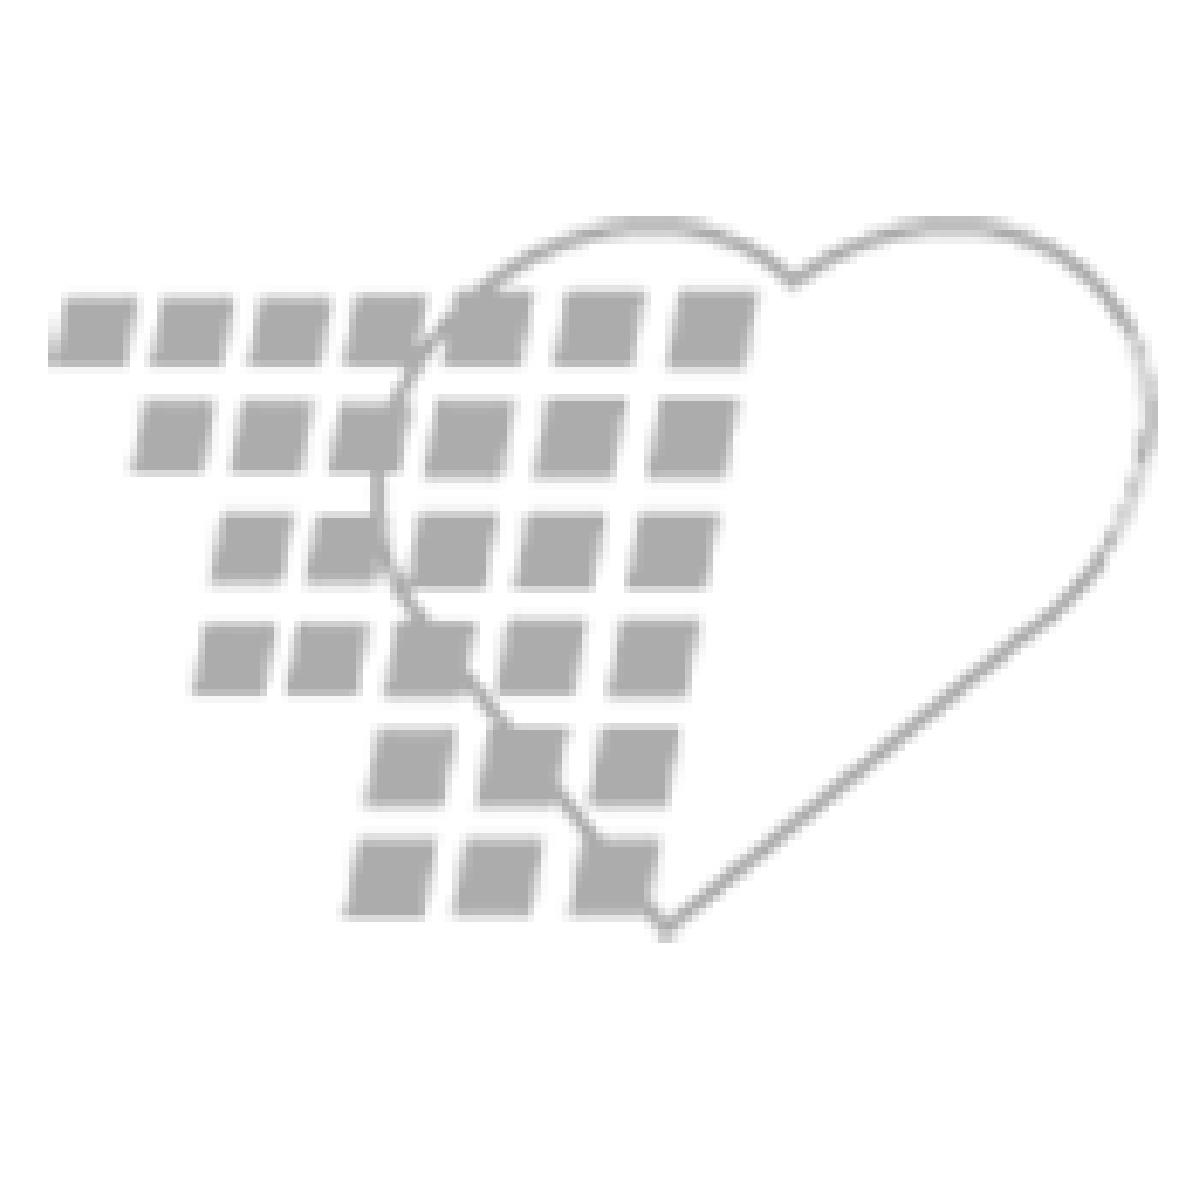 02-70-2381 - Welch Allyn MacroView Otoscope Head